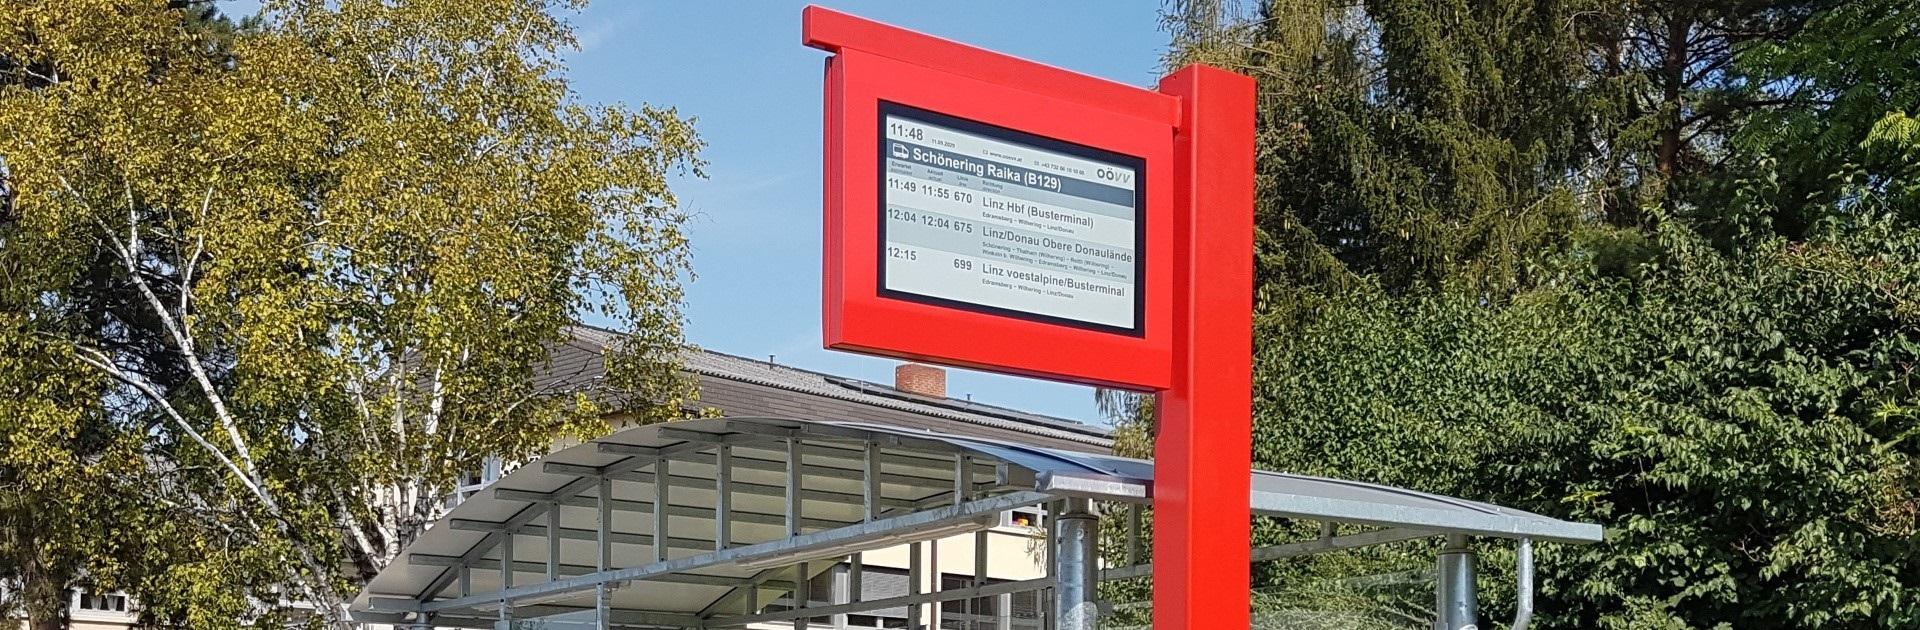 32″ Overhead passenger information